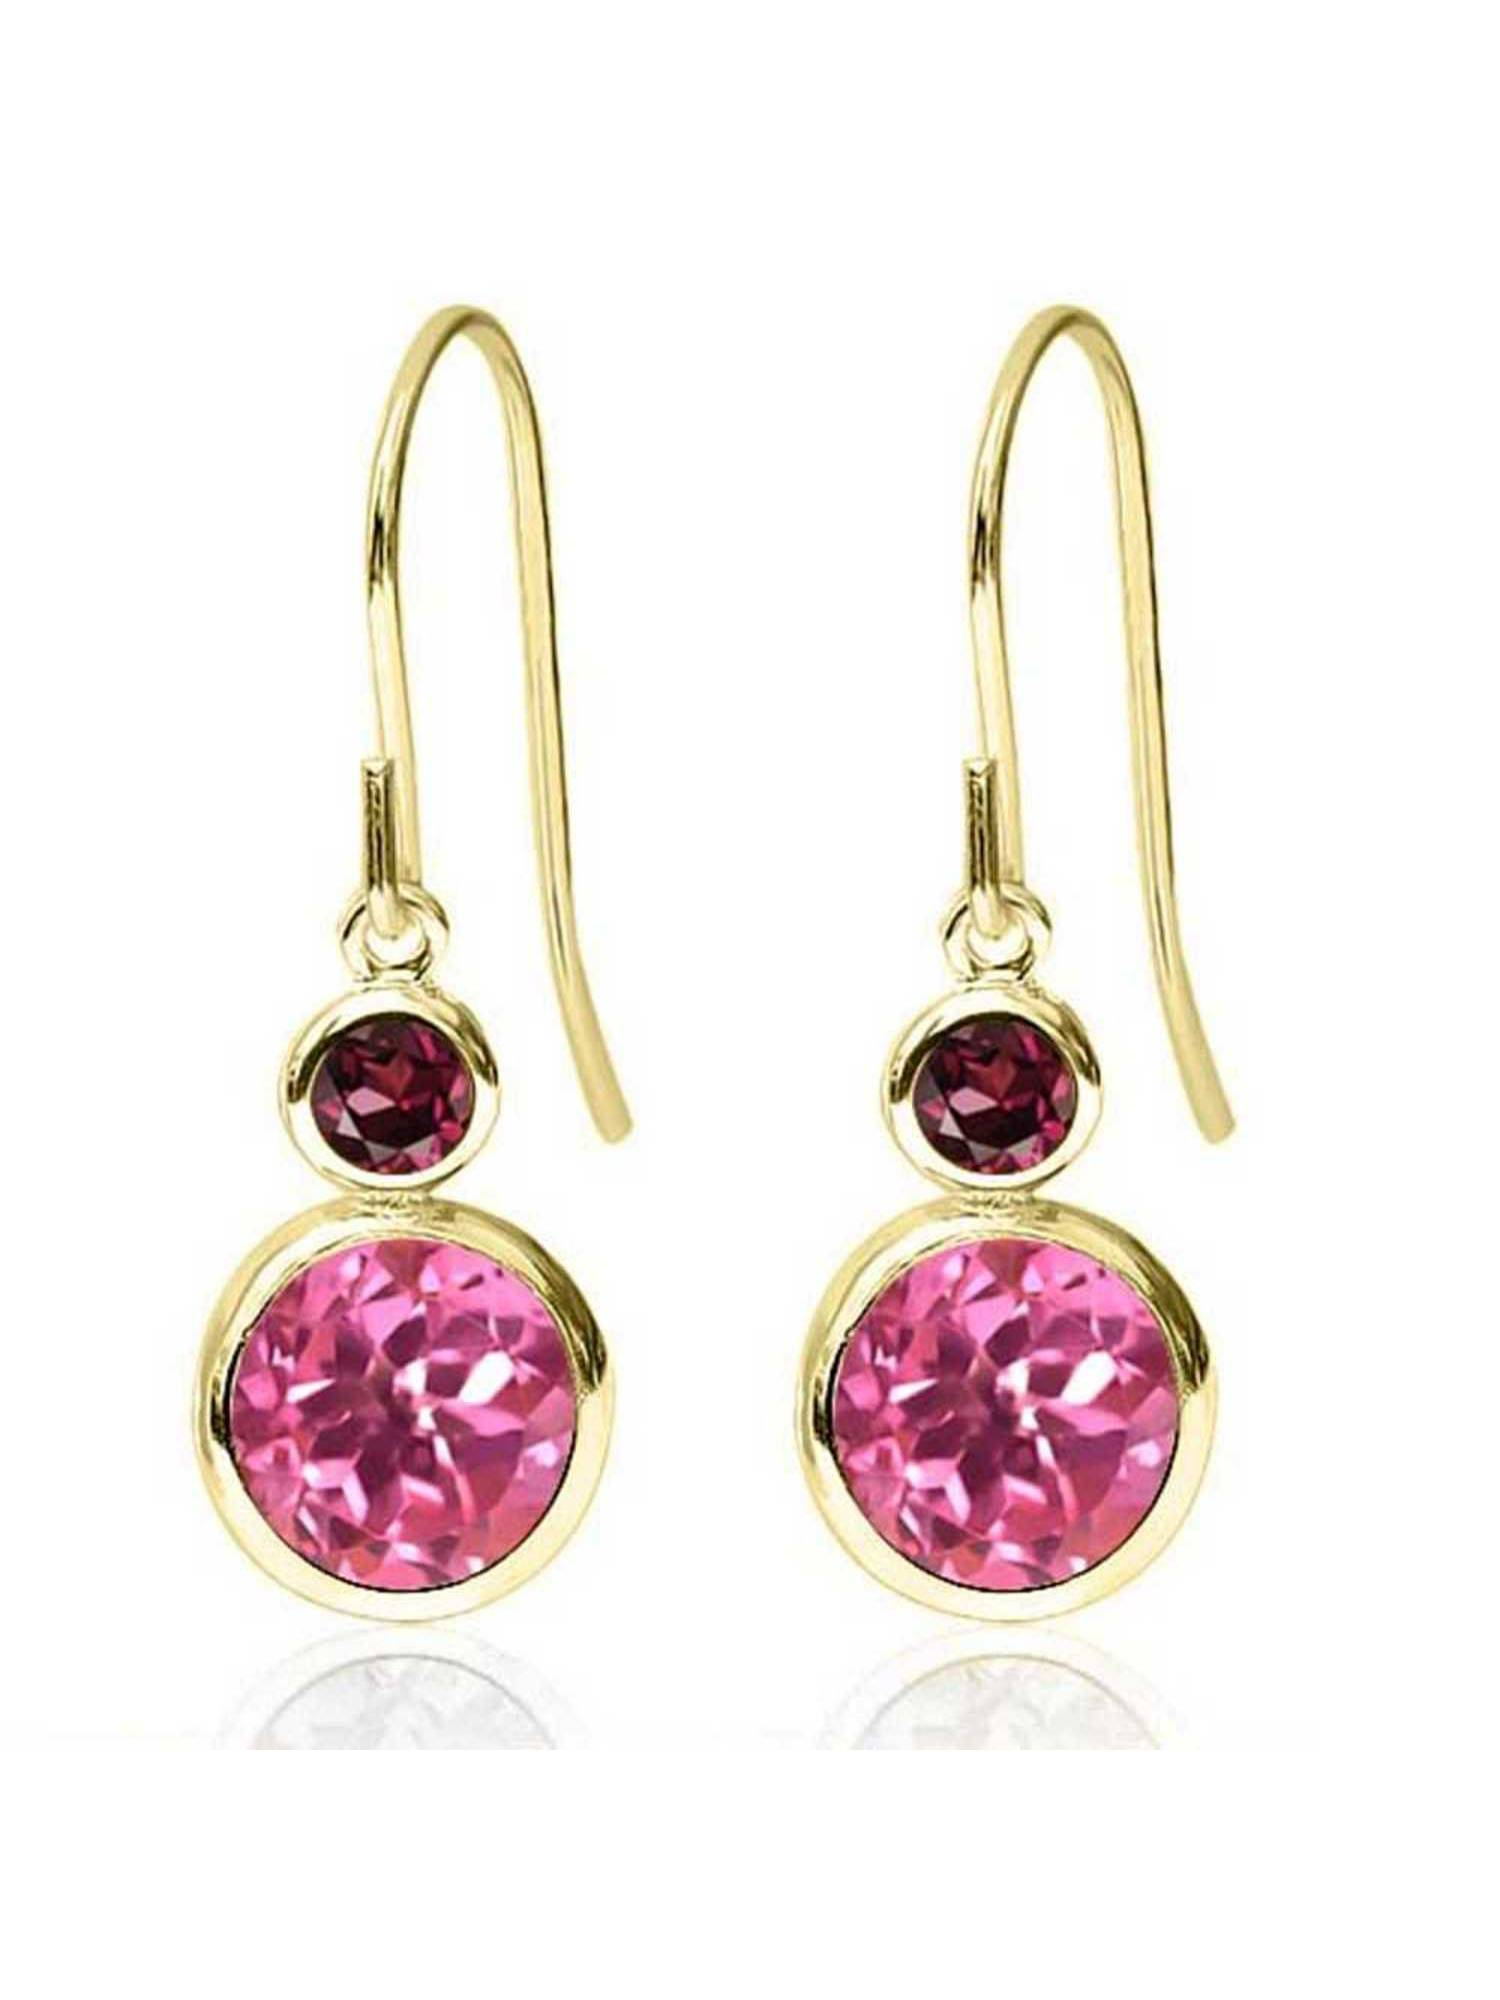 2.24 Ct Round Pink Mystic Topaz Red Rhodolite Garnet 14K Yellow Gold Earrings by